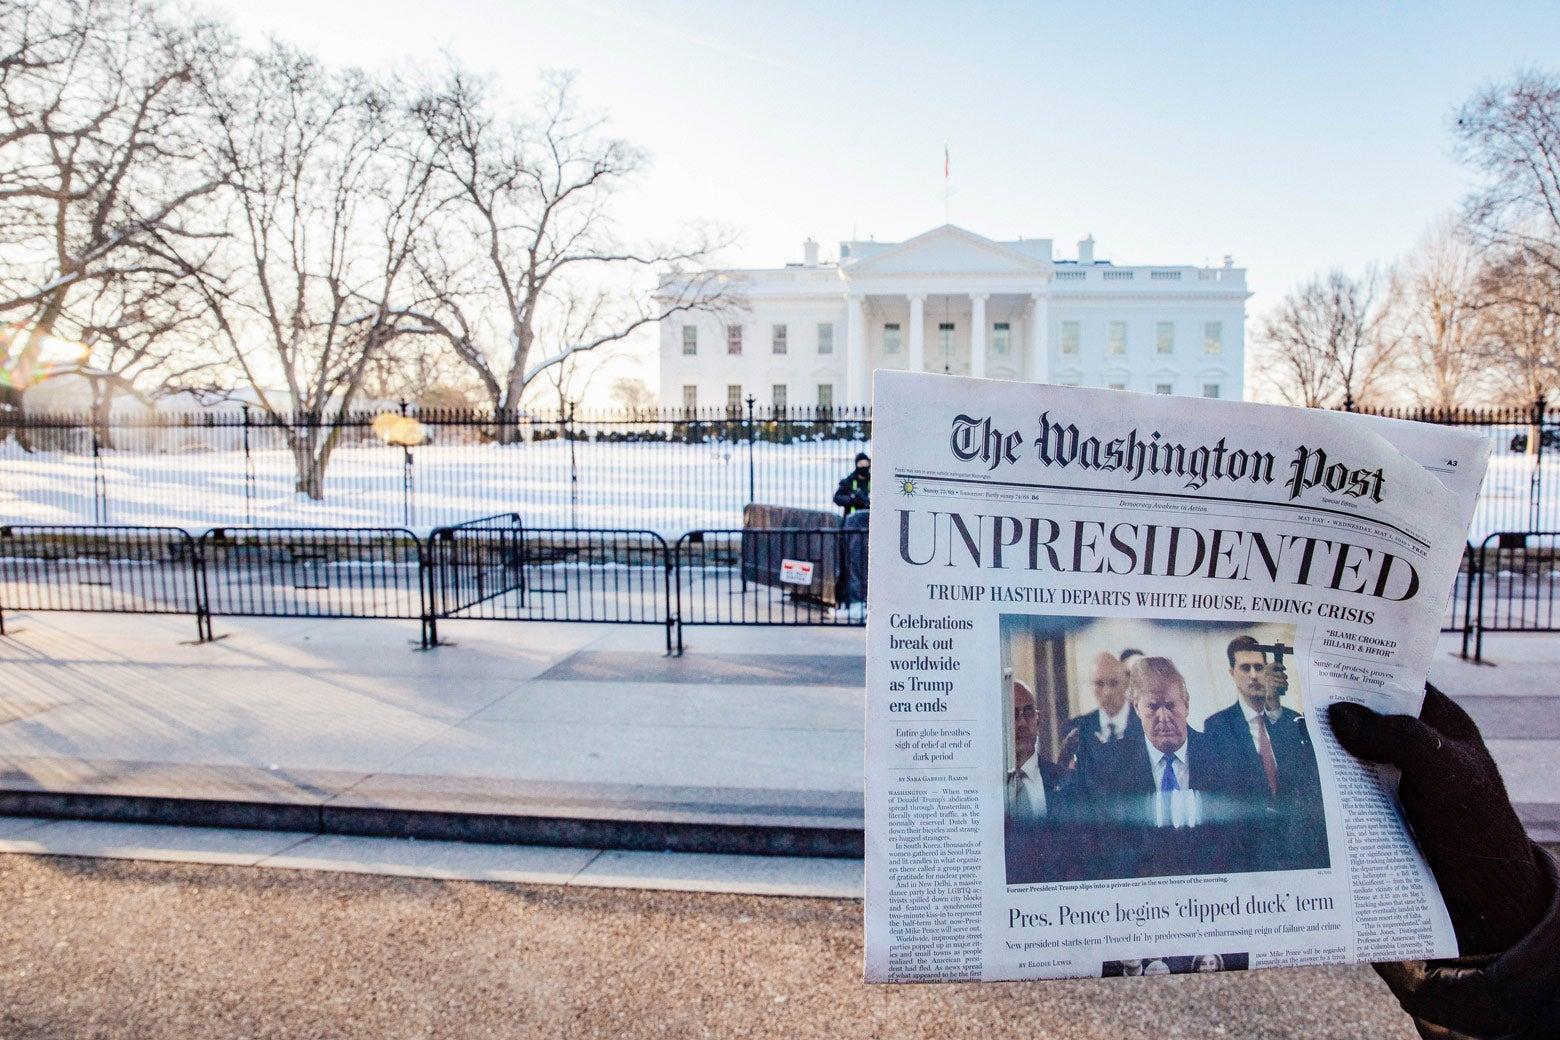 slate.com - April Glaser - The Fake Washington Post Wasn't Fake News